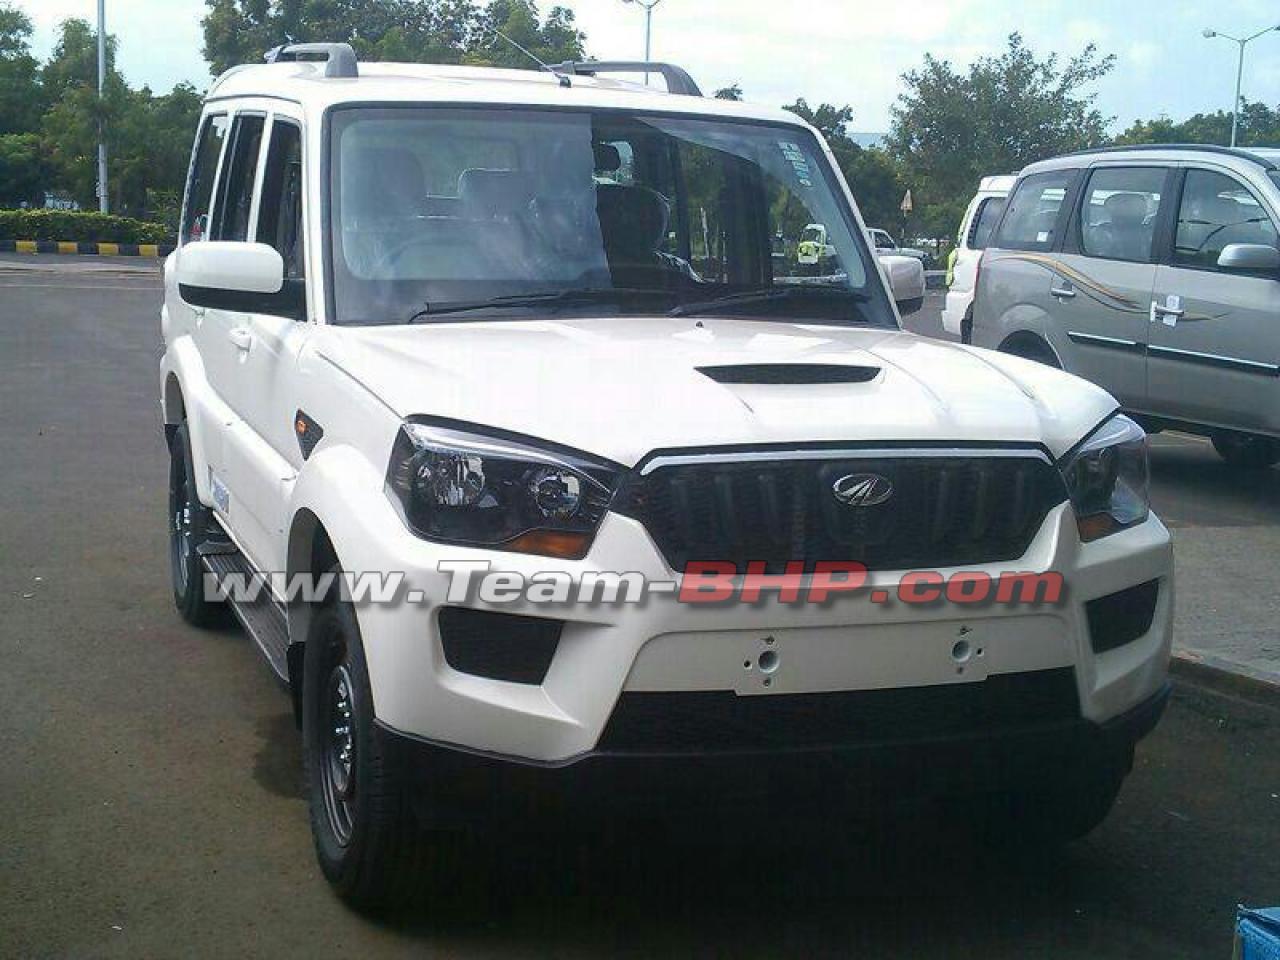 Mahindra Scorpio facelift without camouflage